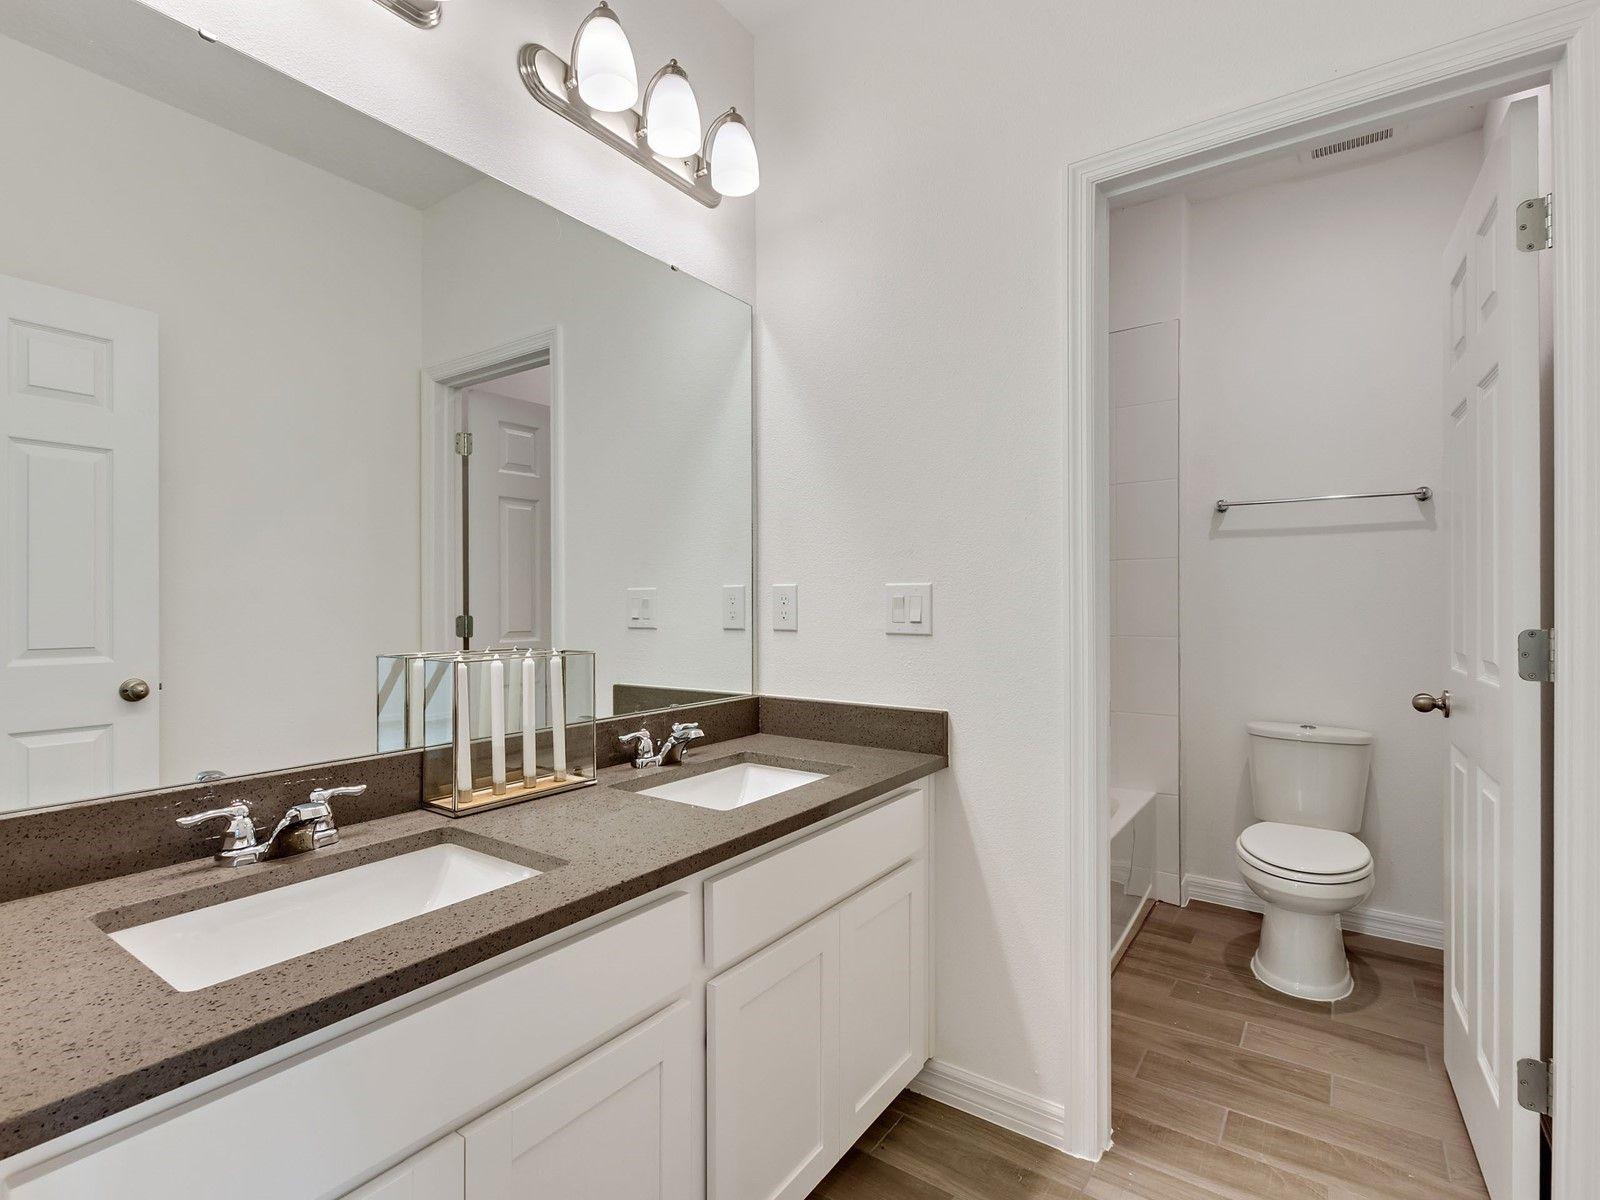 Bathroom featured in the Tennyson By Meritage Homes in Daytona Beach, FL